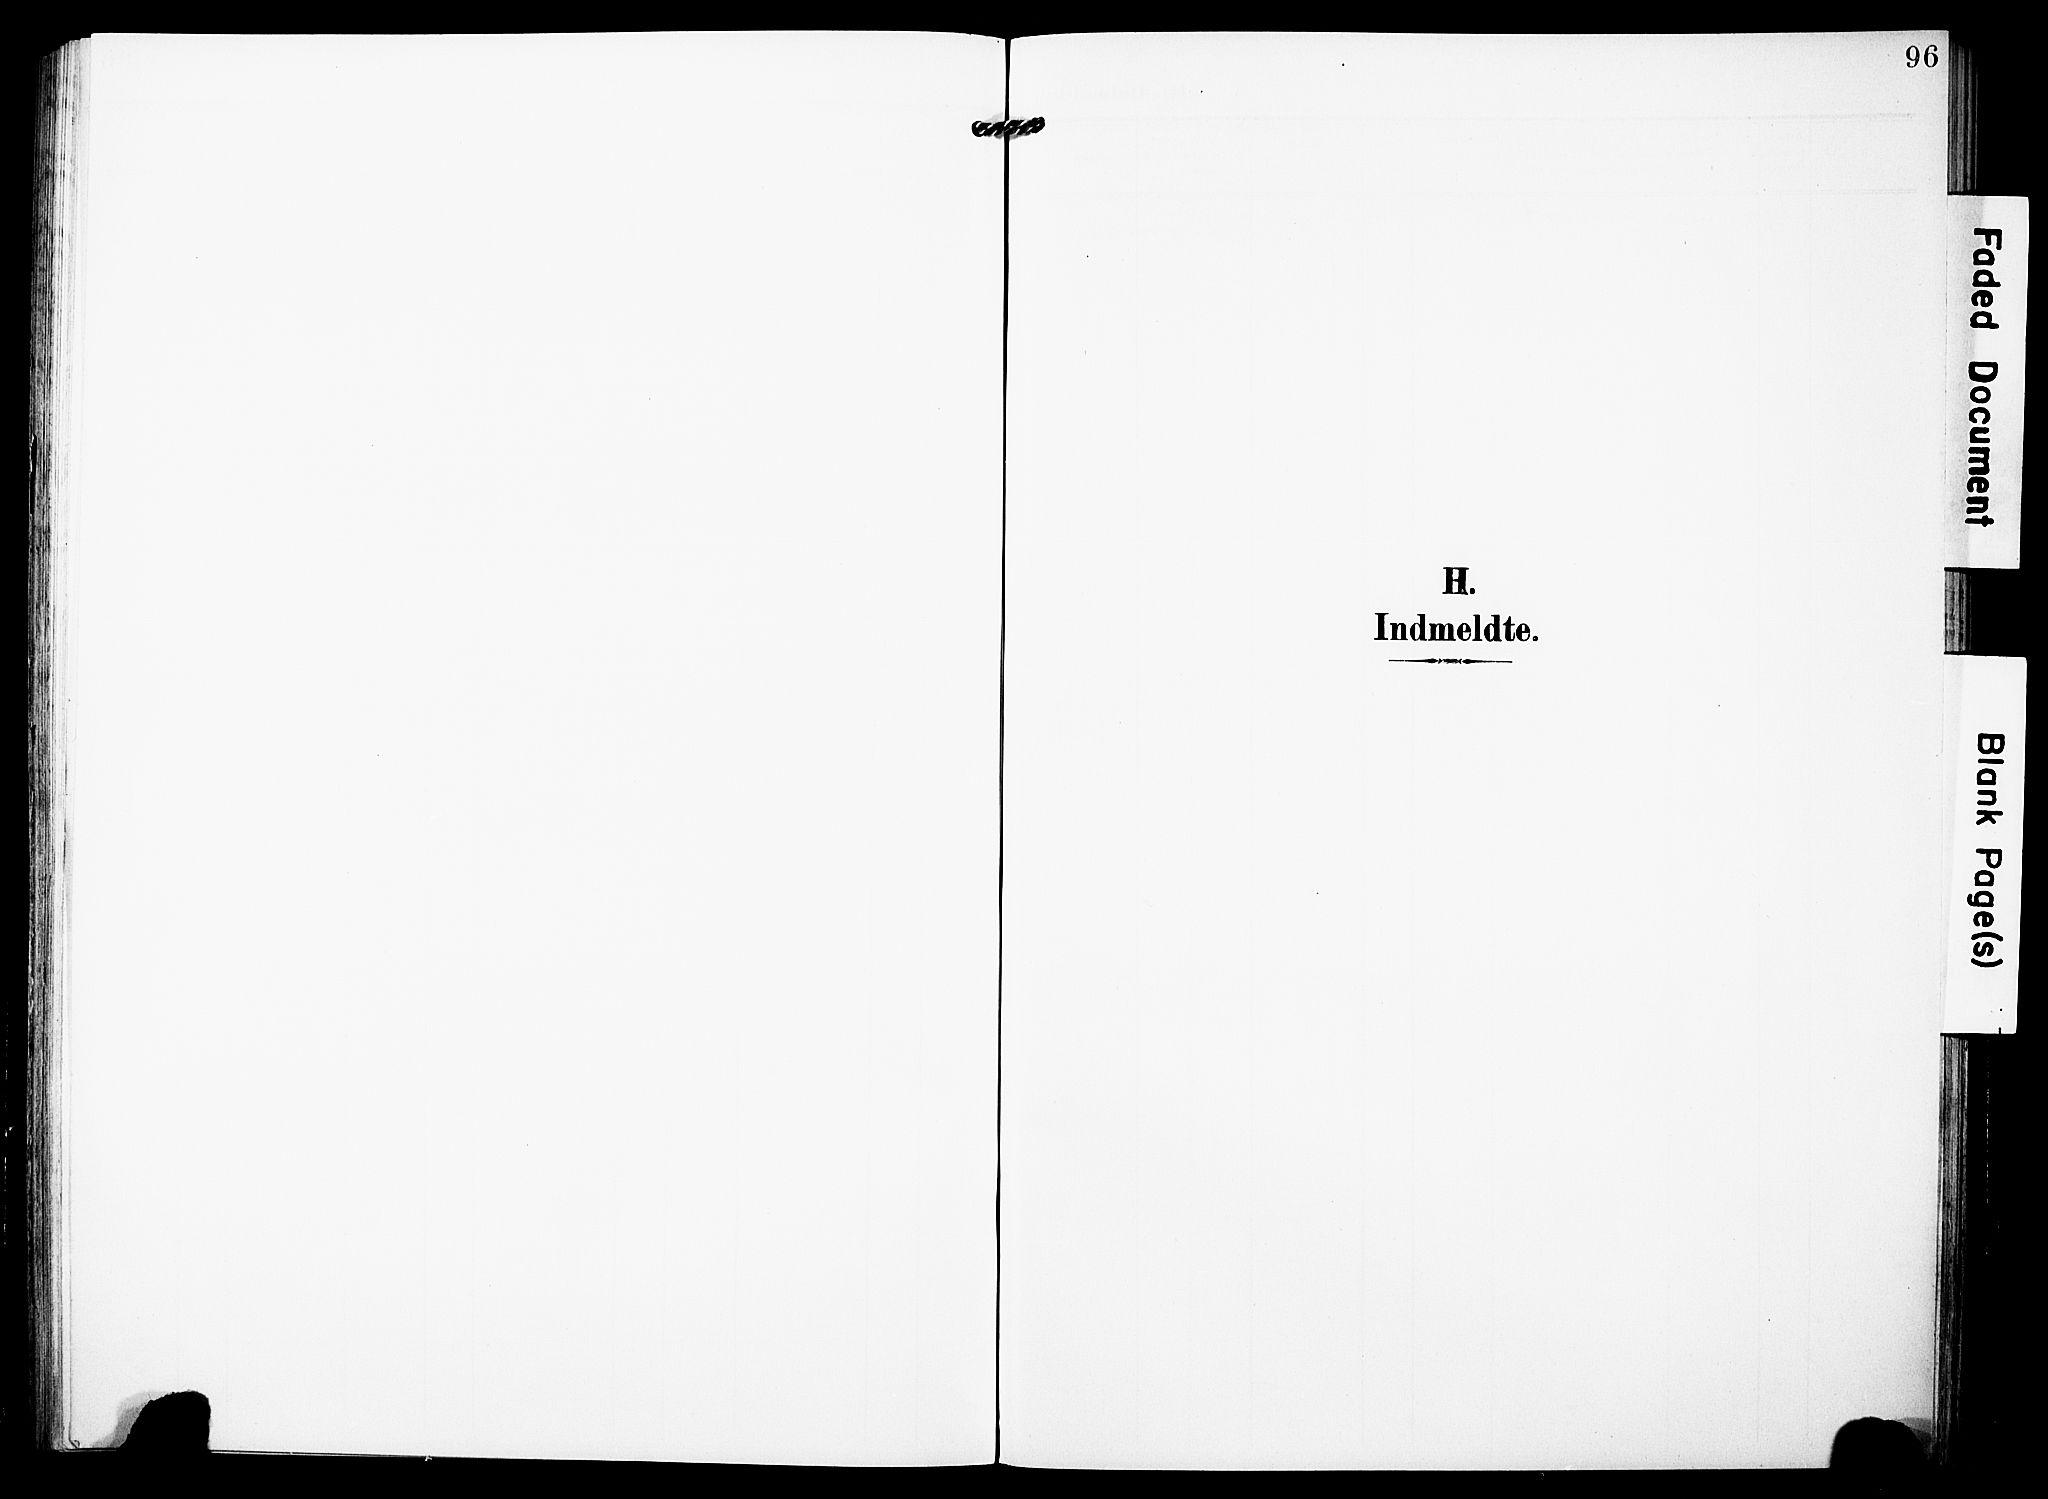 SAST, Torvastad sokneprestkontor, H/Ha/Haa/L0018: Ministerialbok nr. A 17, 1903-1925, s. 96